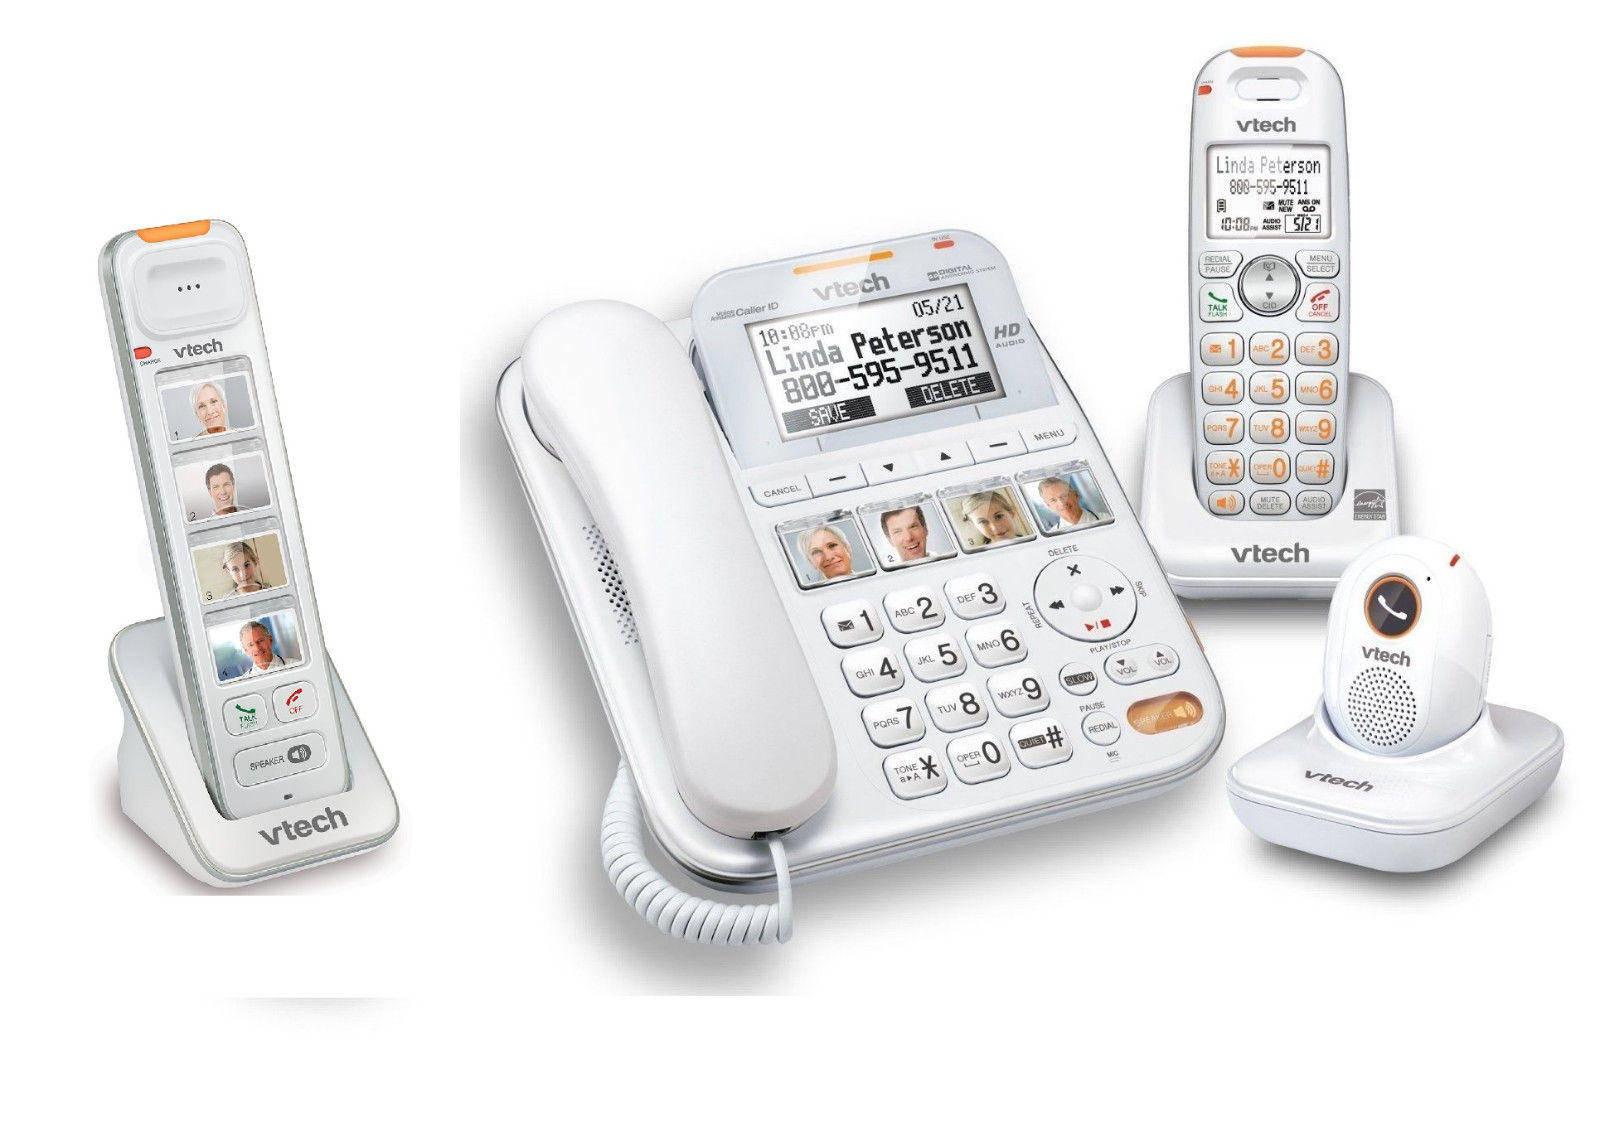 b70a38e1da9 Vtech Careline Plus SN6197 Phone System With SN6307 ...